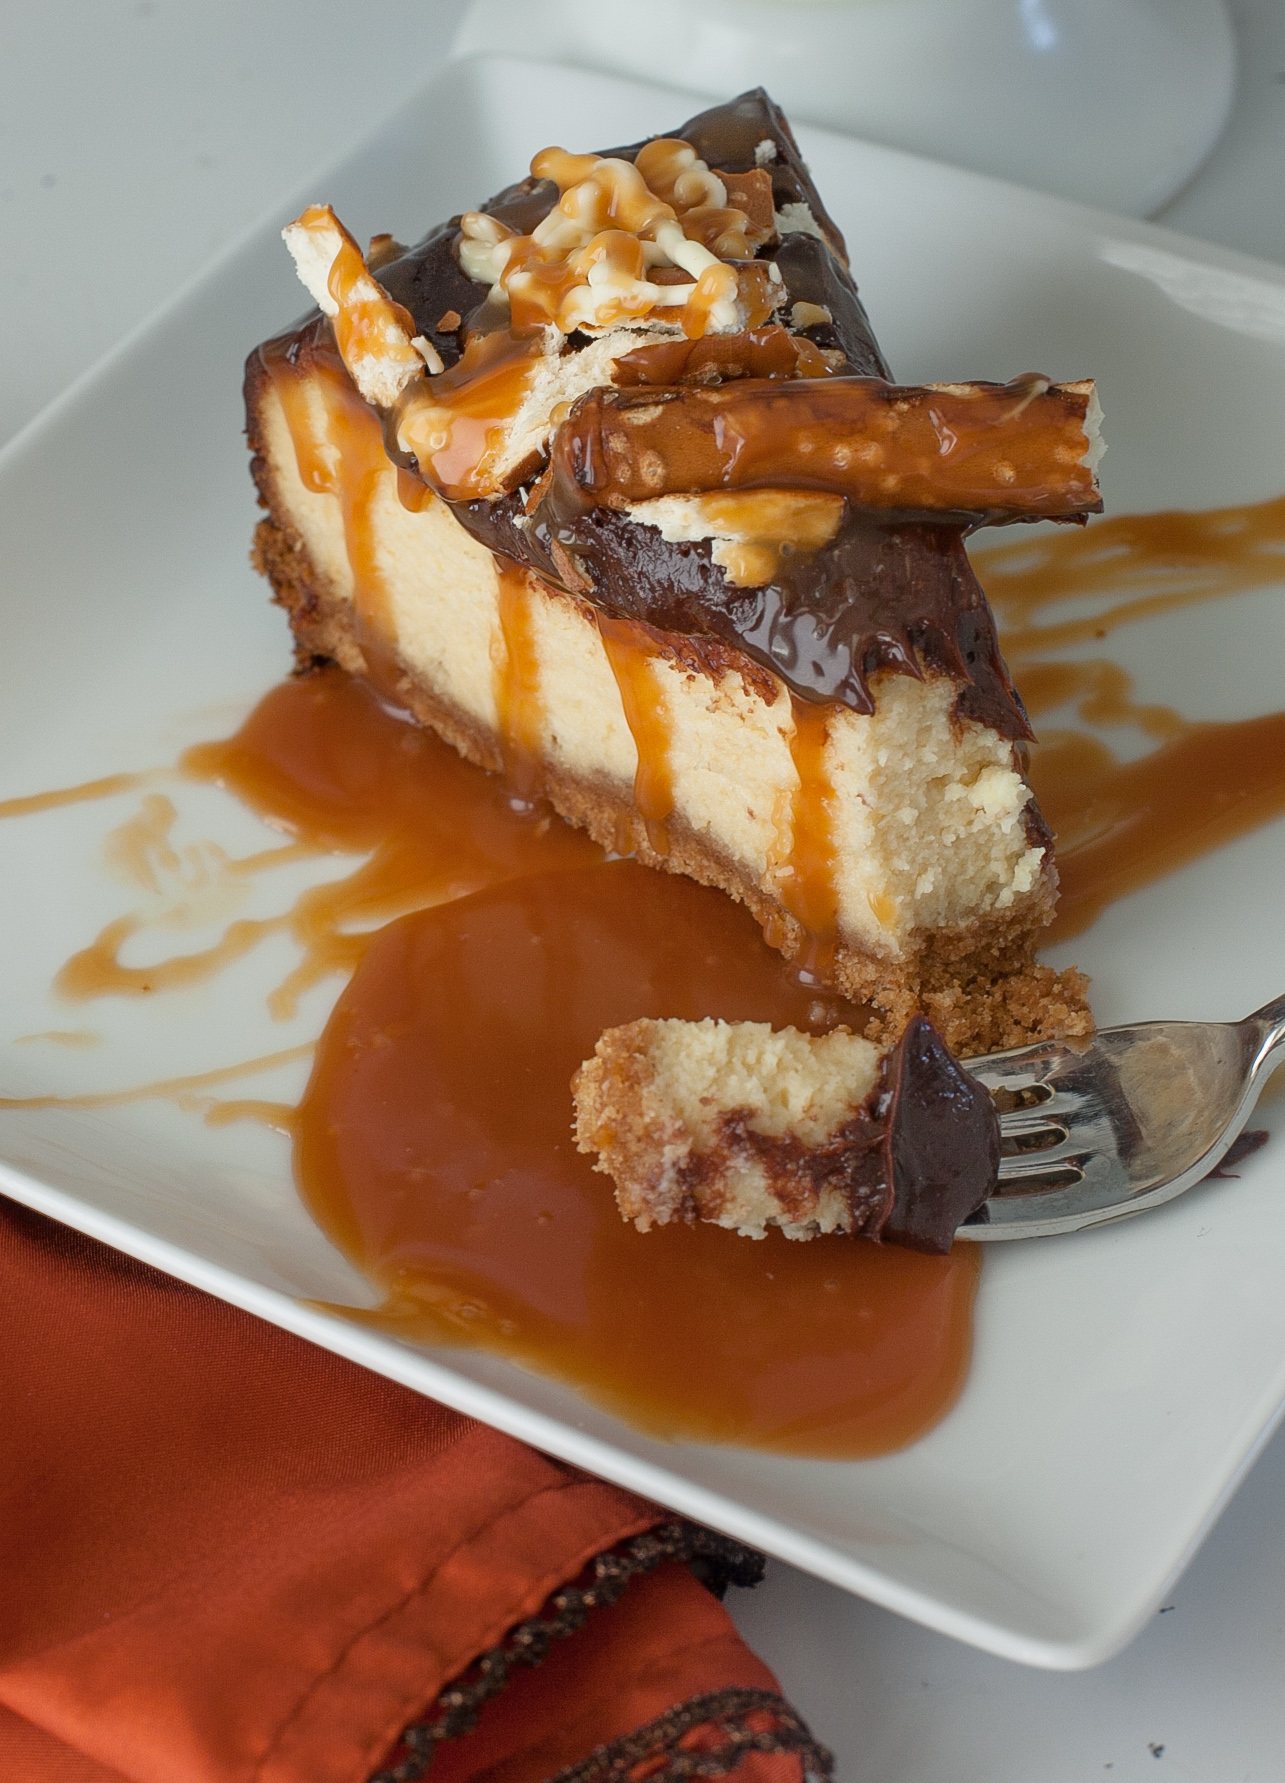 Chocolate Salted Caramel Pretzel Cake